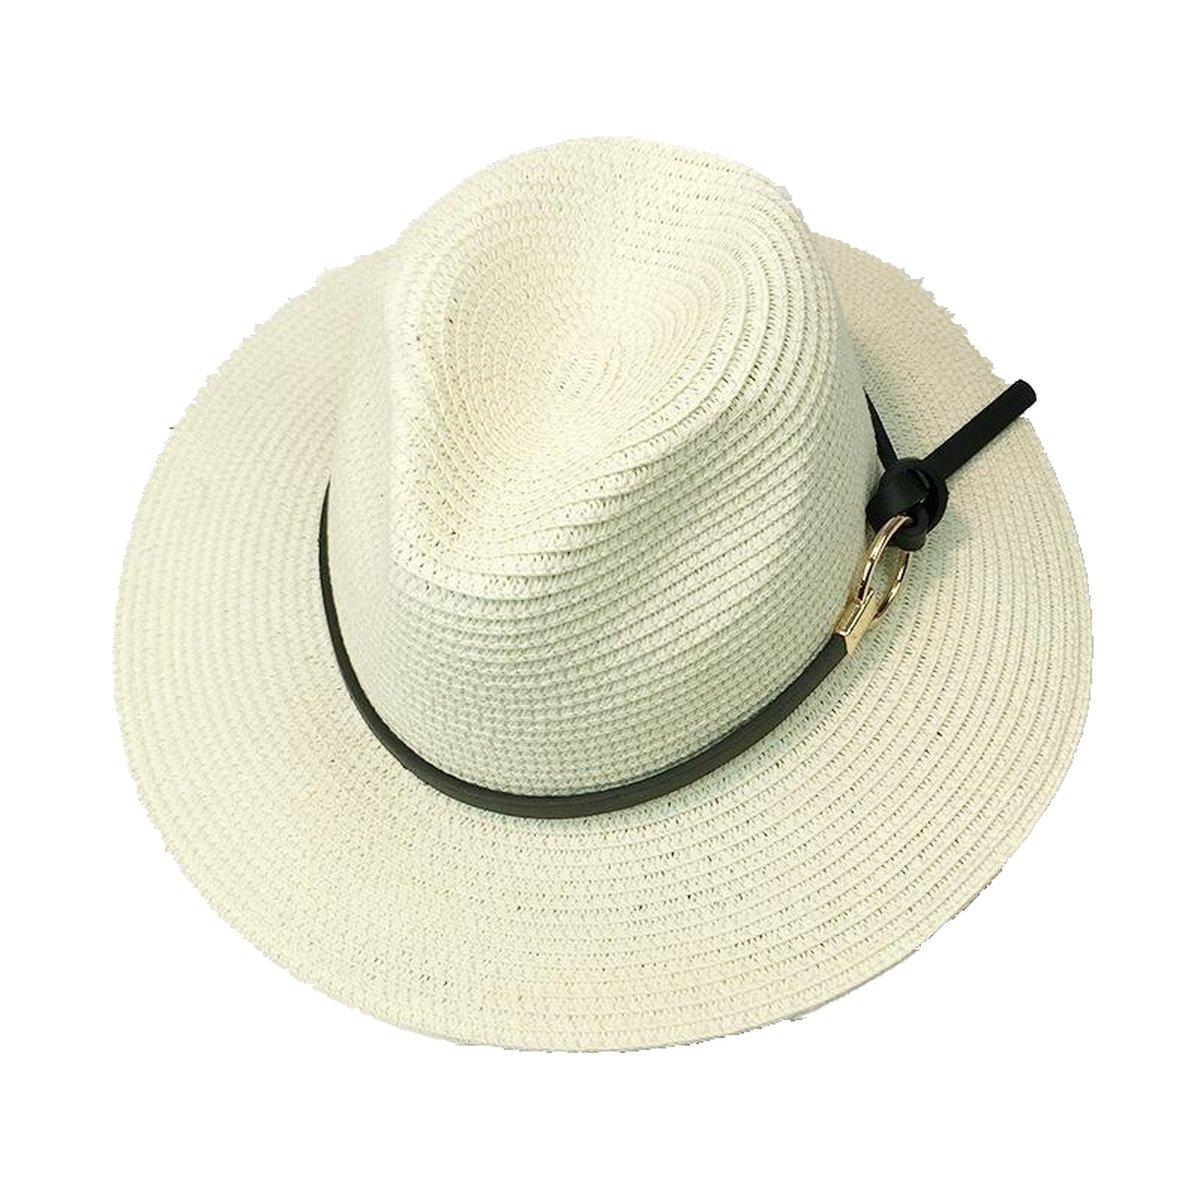 Summer Sun Hat Wide Brimmed Jazz Panama Hat Chapeu Visor Beach Travel Cappello